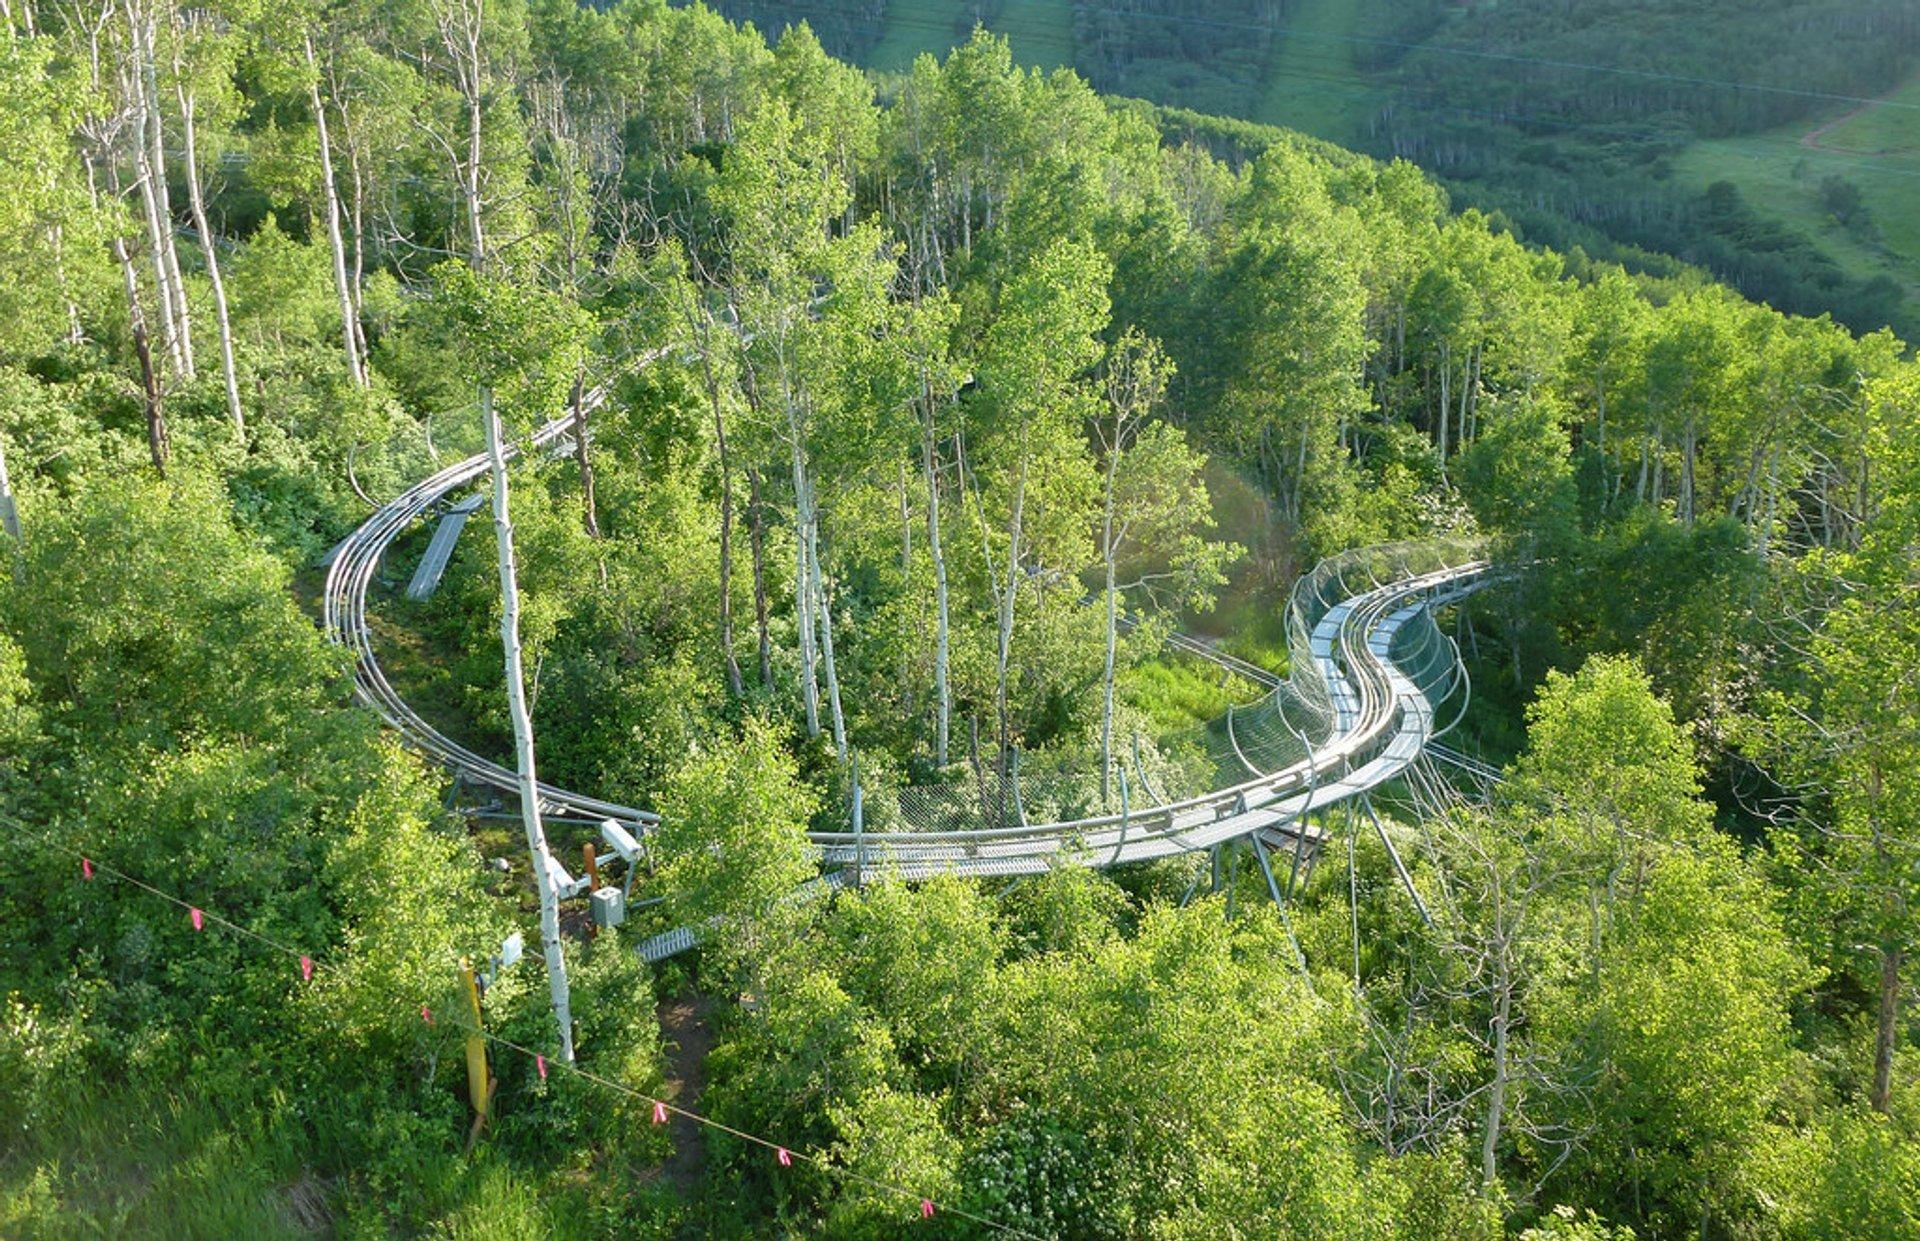 Alpine Coaster in Utah 2020 - Best Time